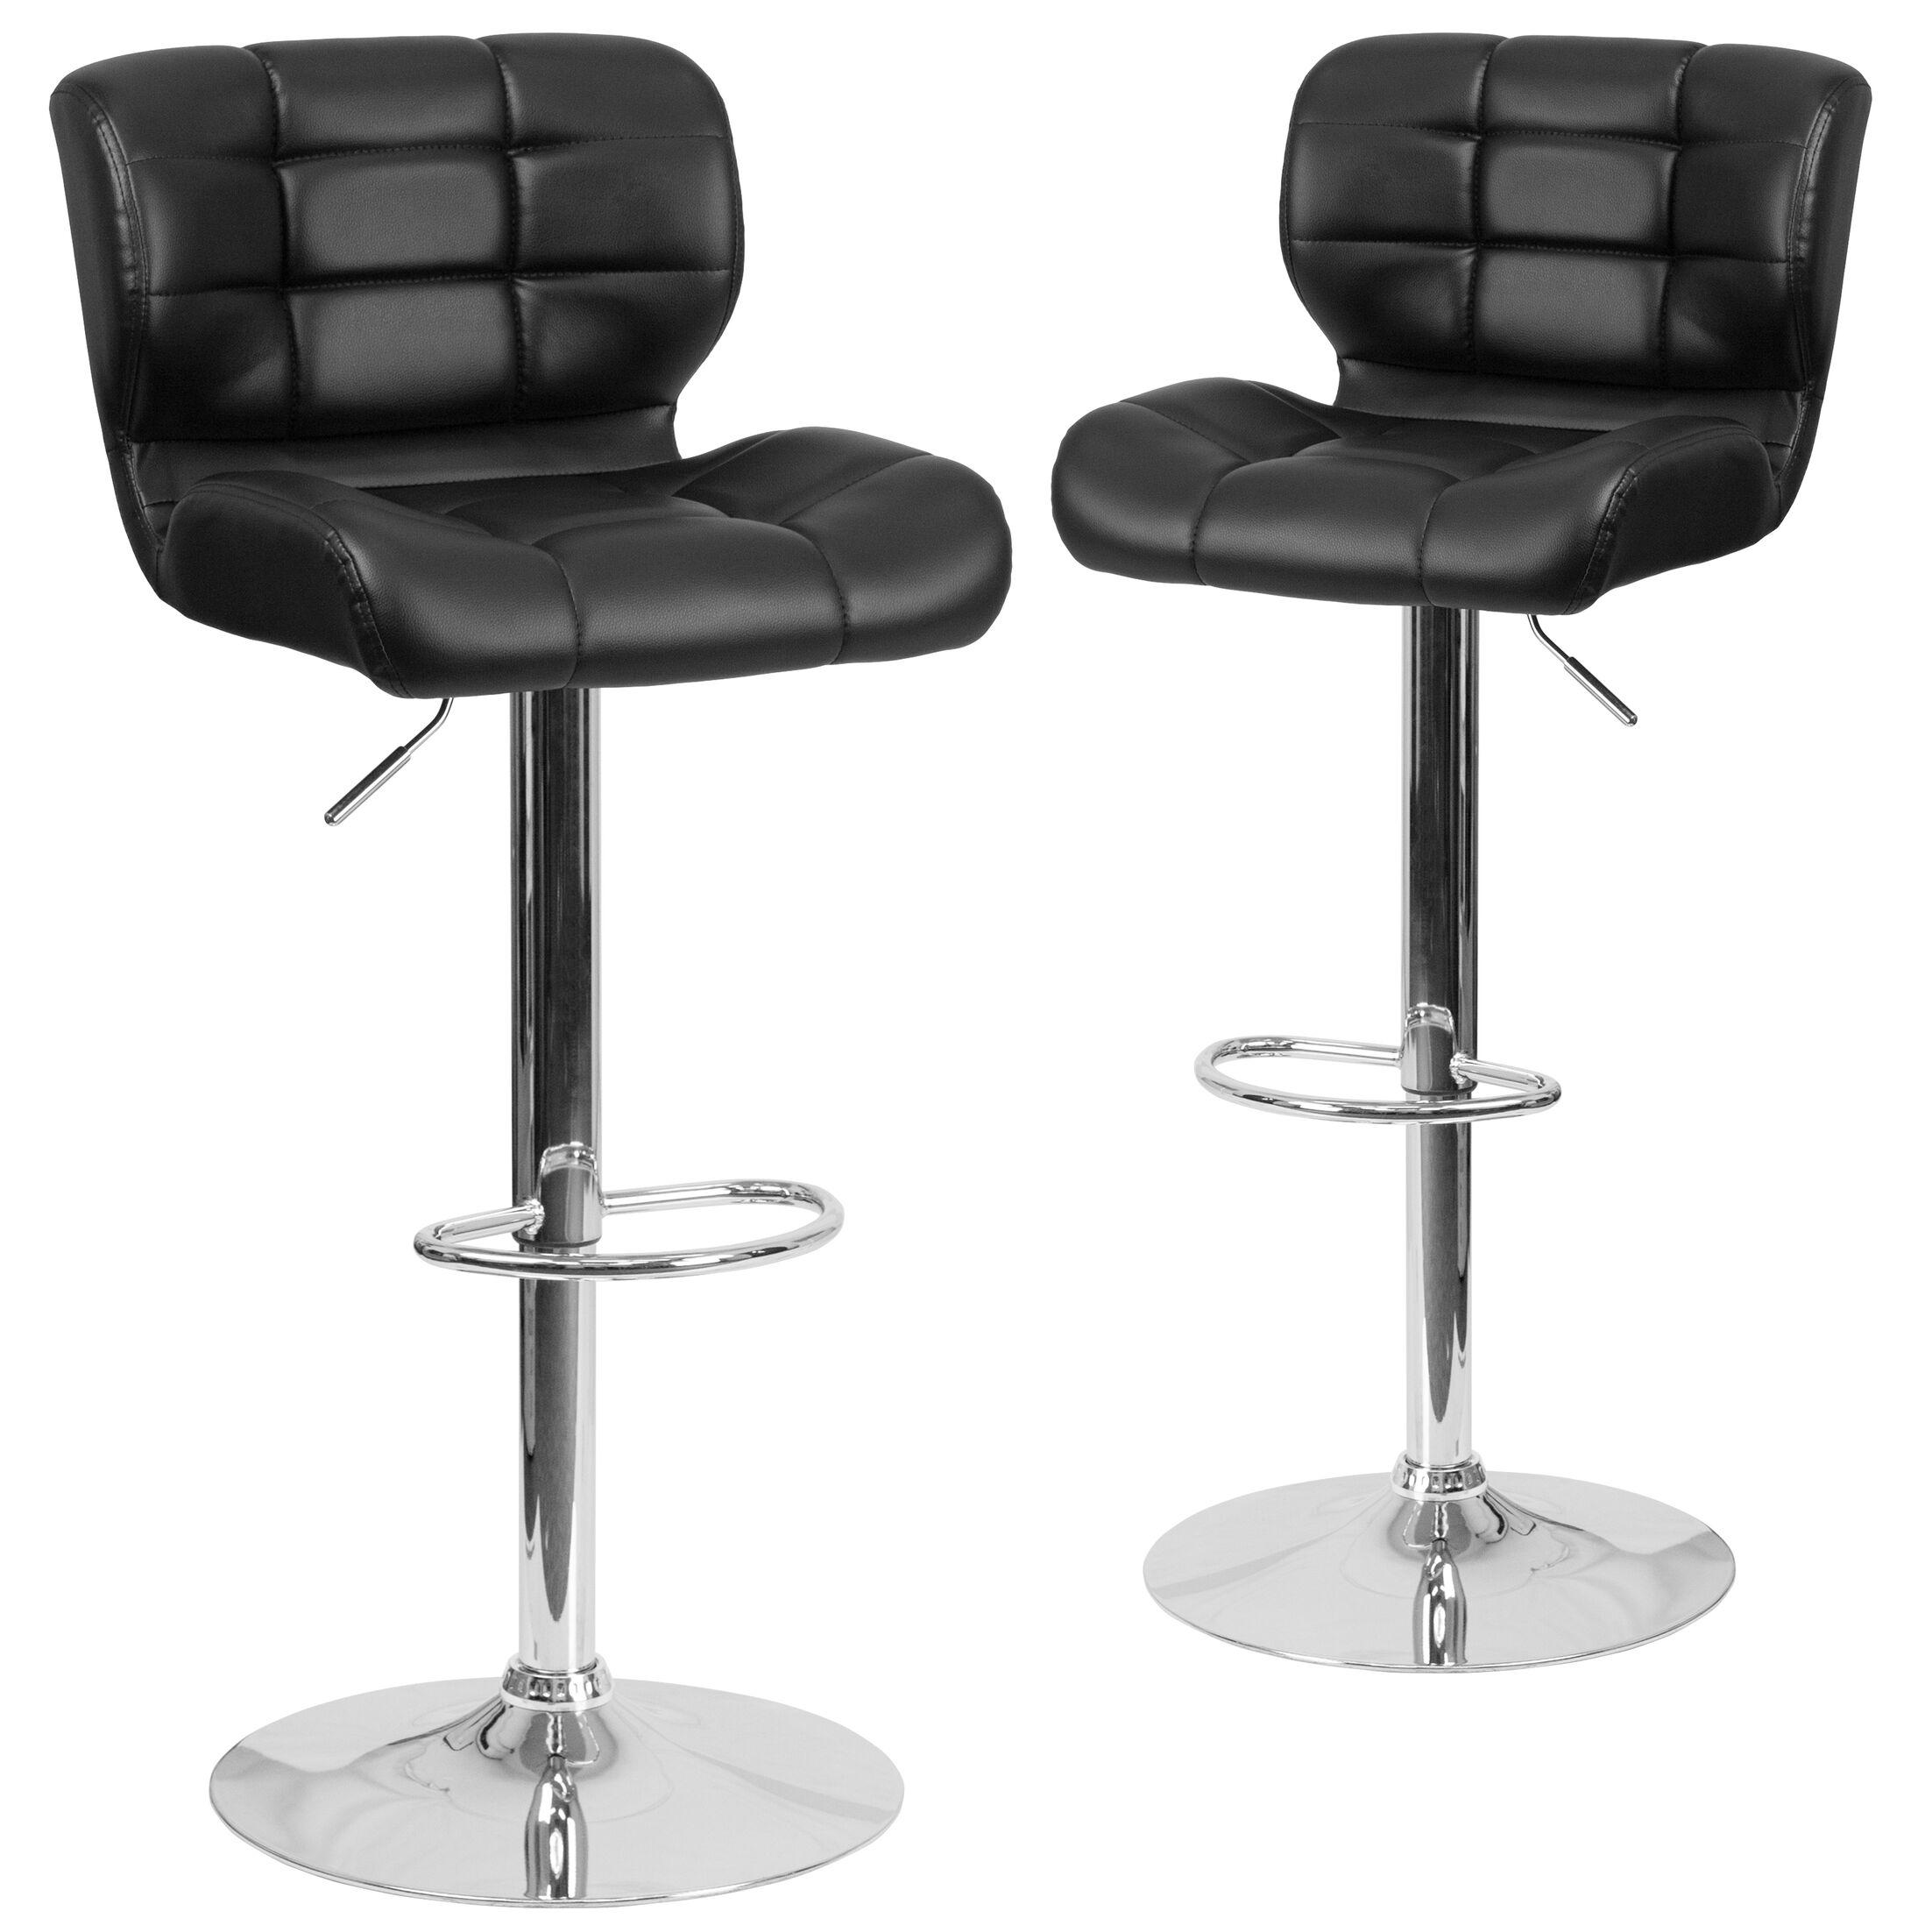 North Widcombe Adjustable Height Swivel Bar Stool Upholstery: Black